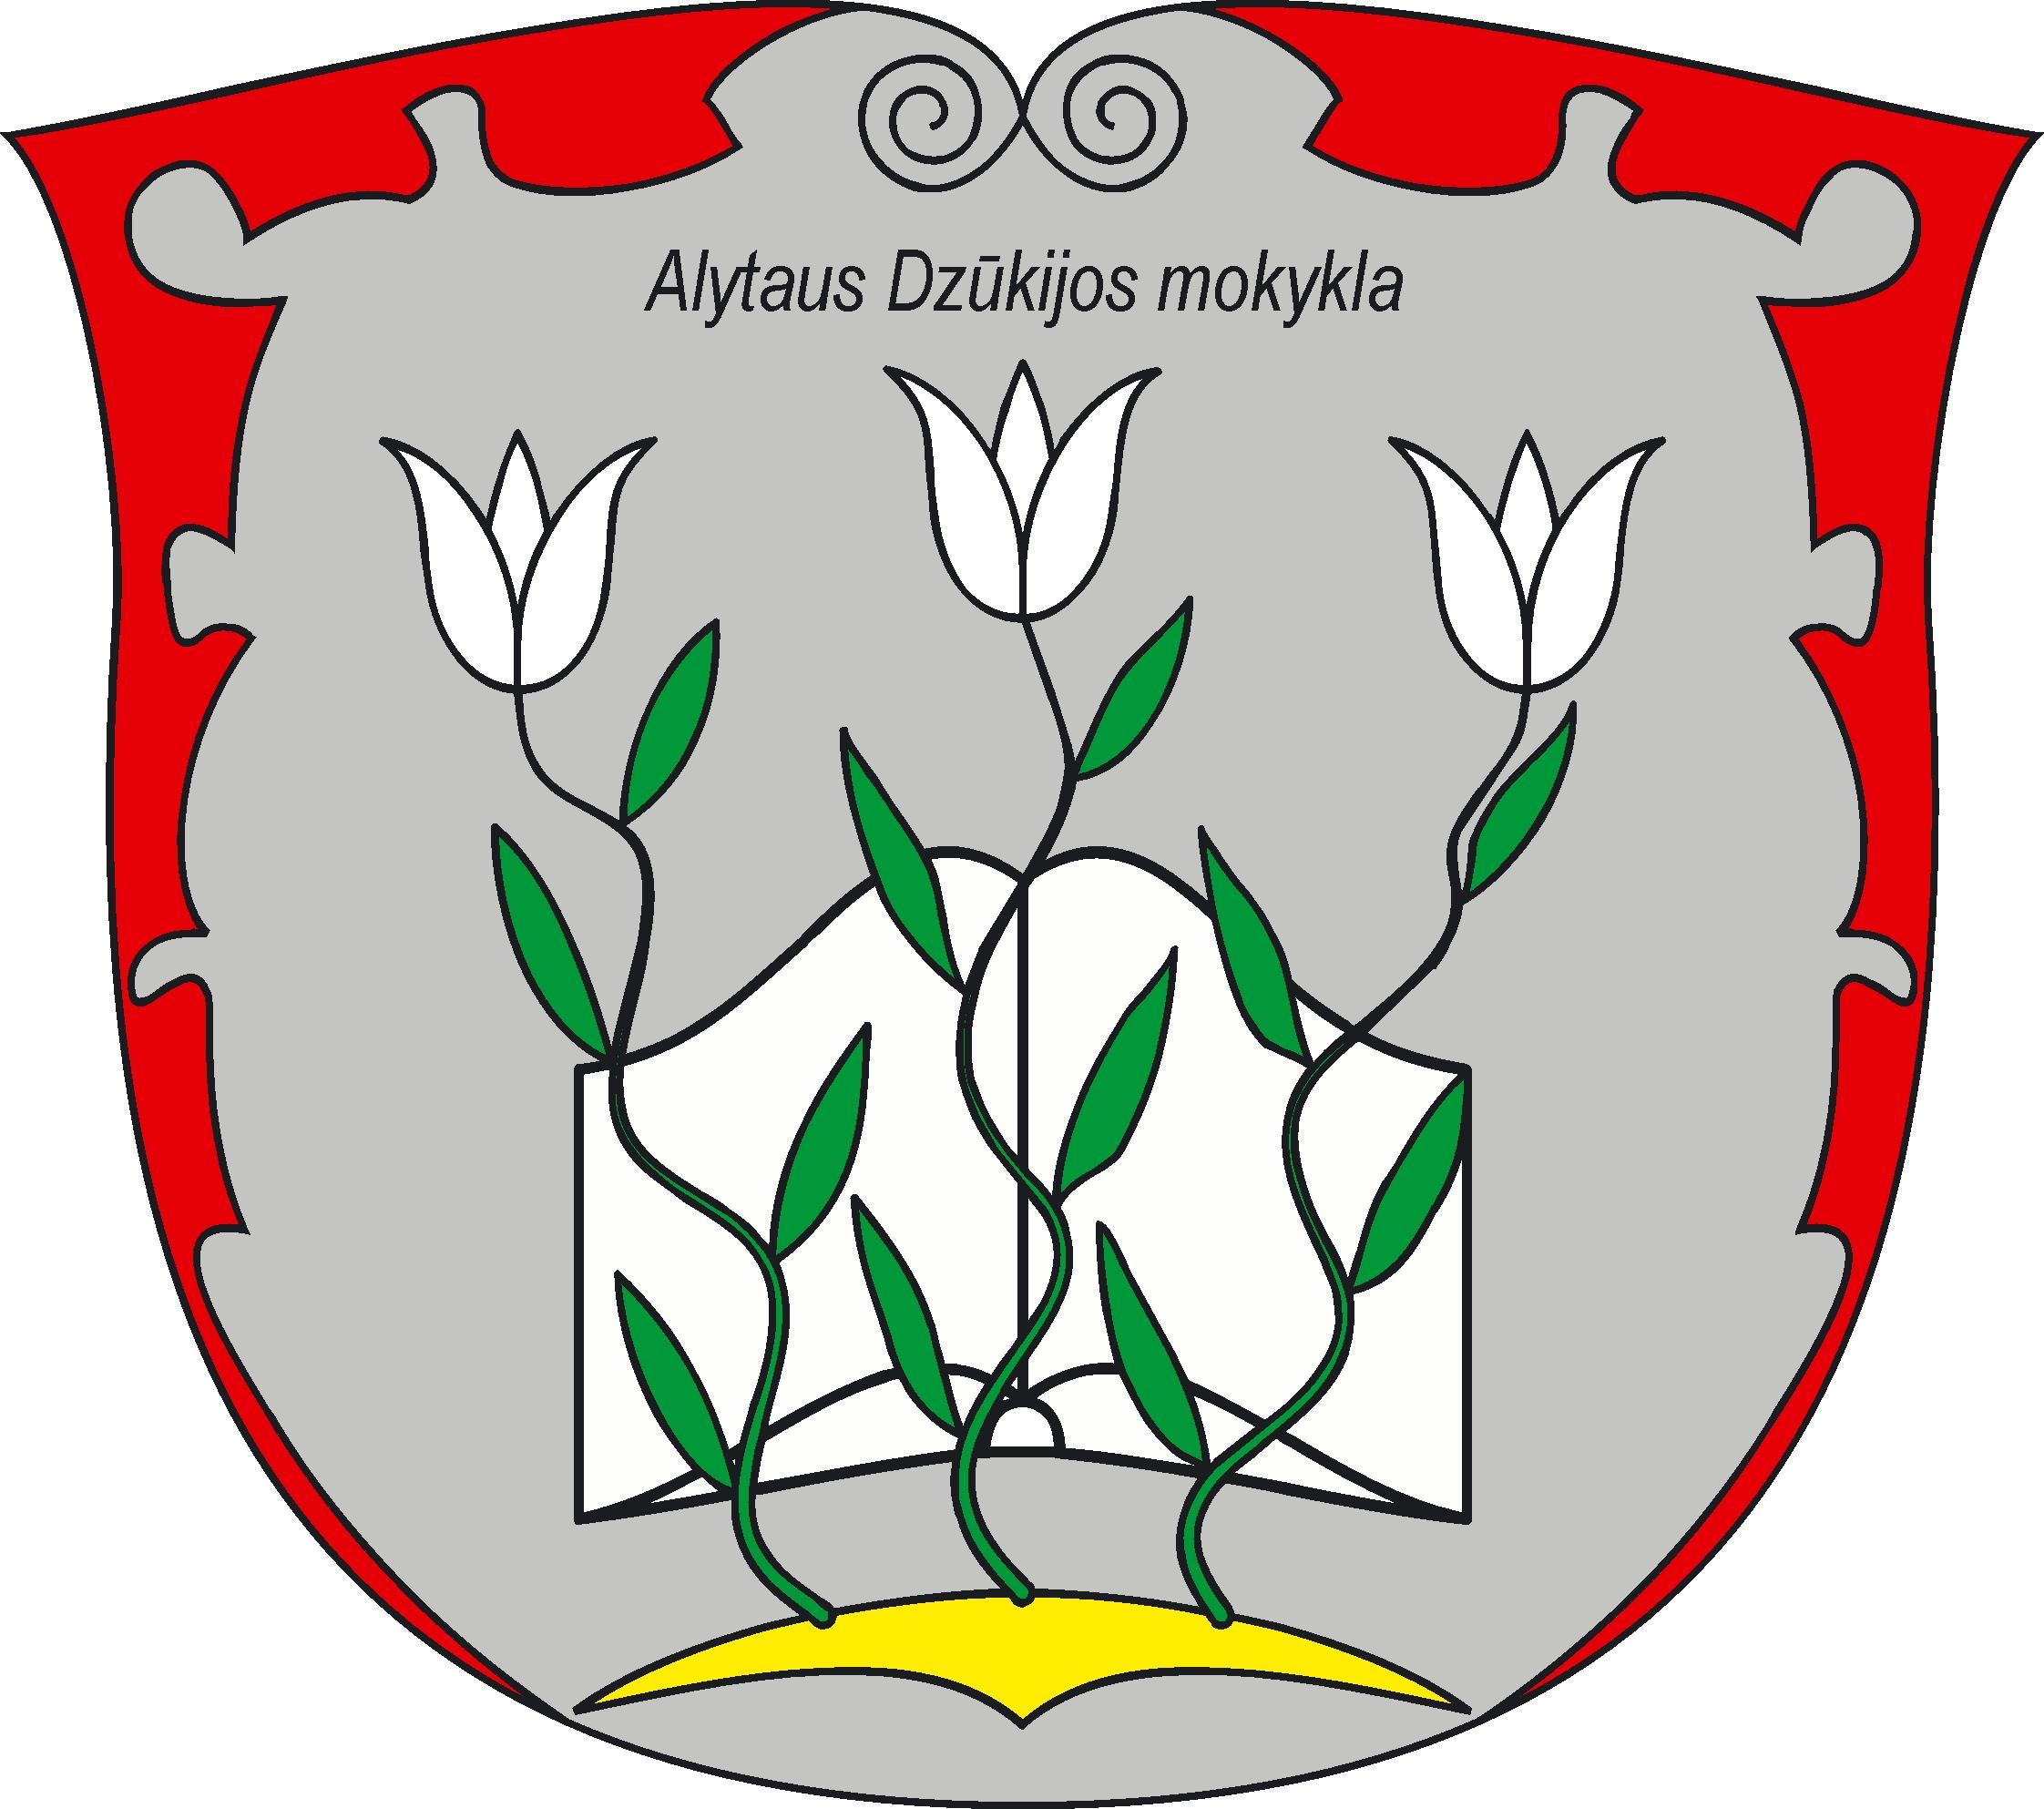 Alytaus Dzūkijos mokykla